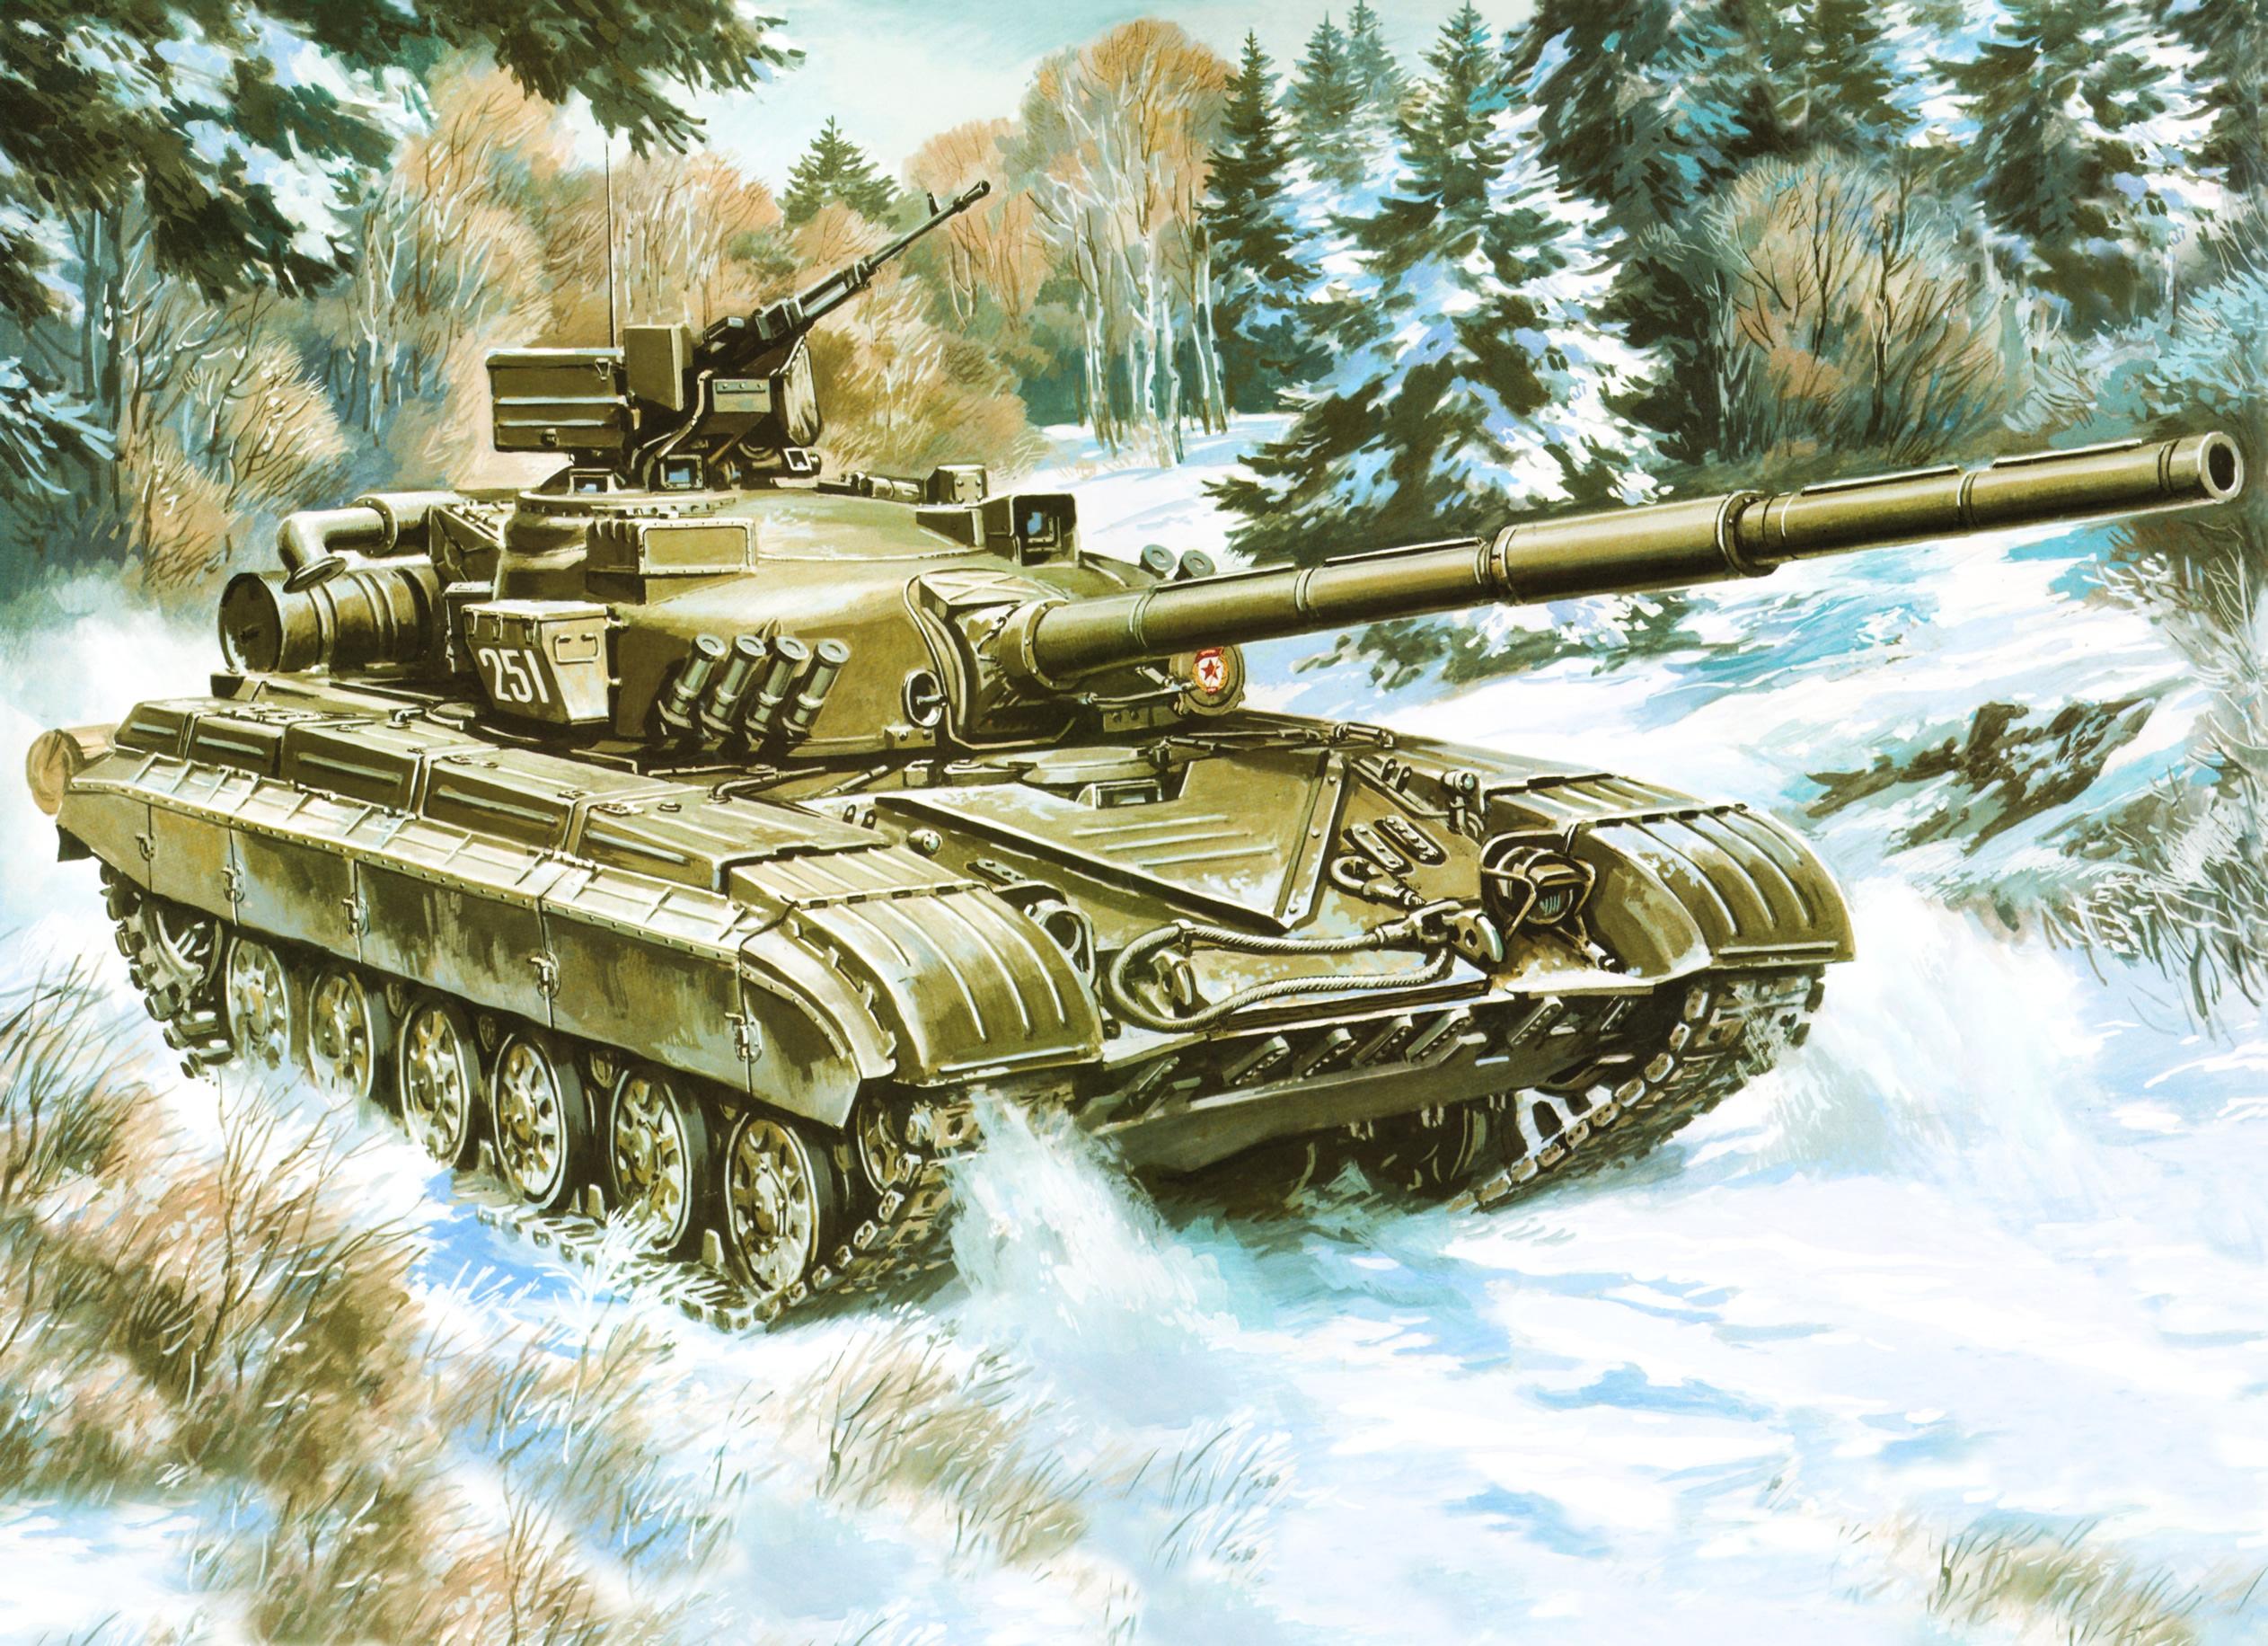 советский танк зимой, снег, скачат фото, танки